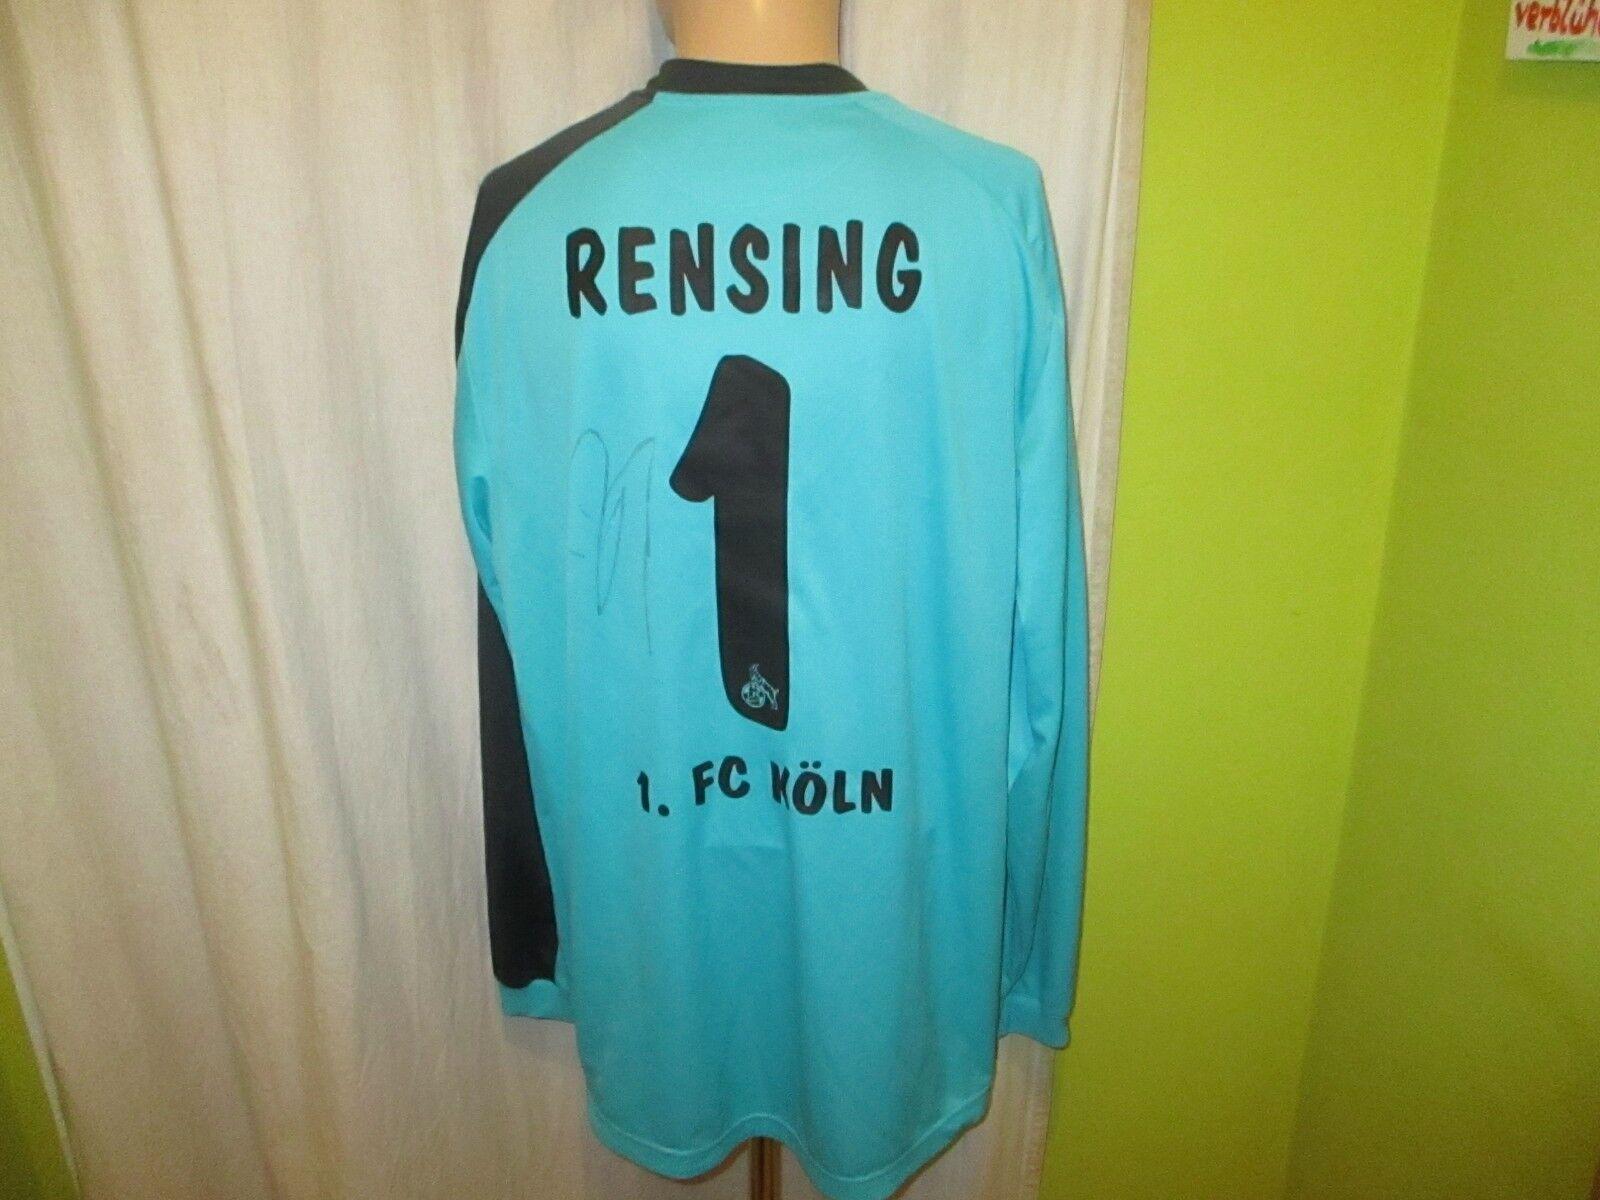 1.FC Köln Reebok Torwart Trikot 2011 12  REWE  + Nr.1 Rensing + Signiert Gr.XXL  | Elegant Und Würdevoll